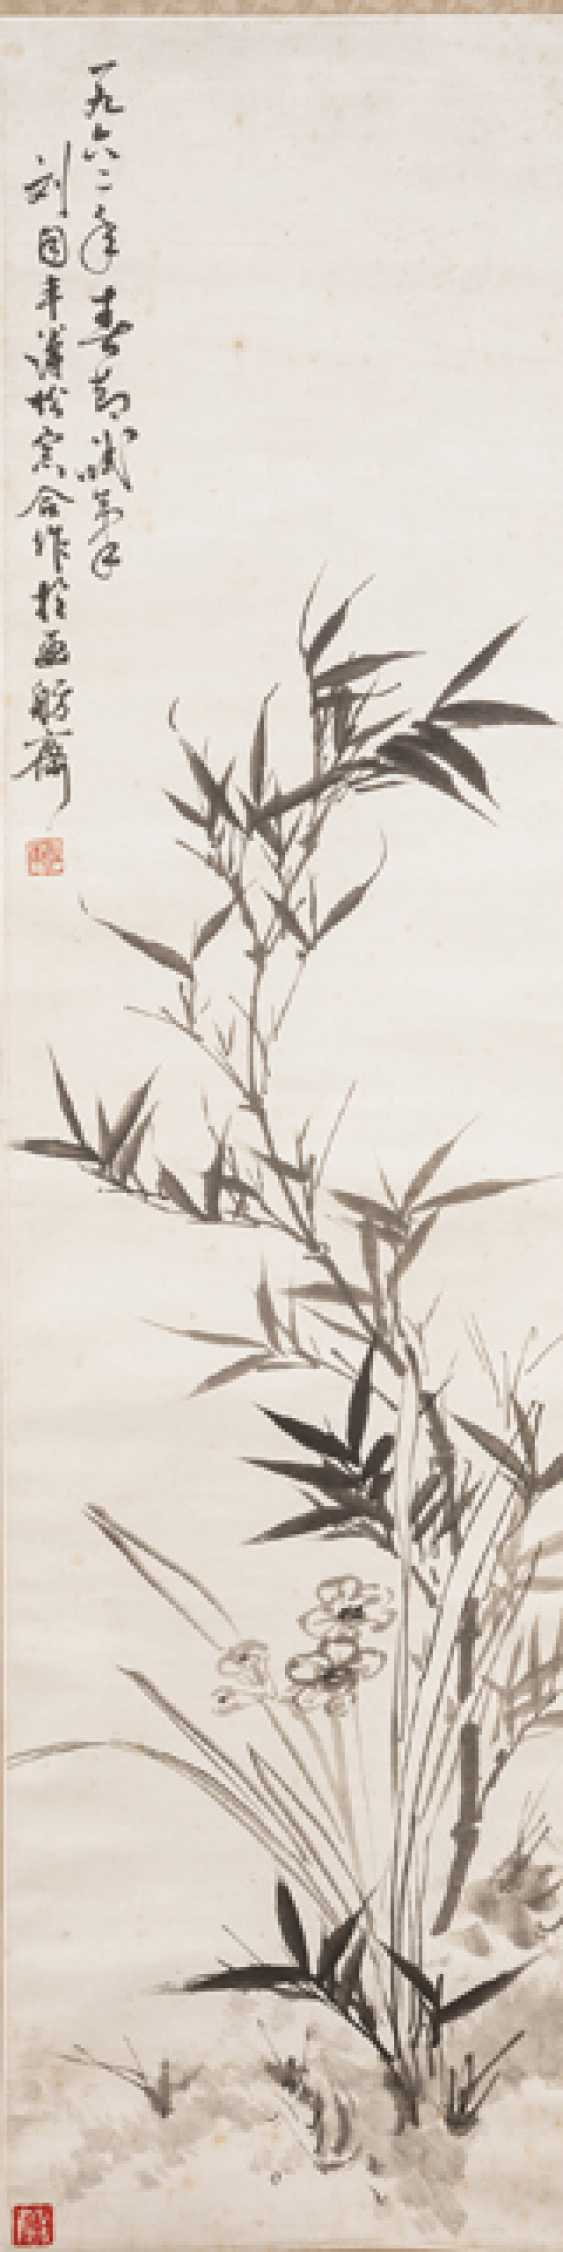 Pu Quan (1913-1991) und Liu Tongfeng (1918-1976) - photo 1